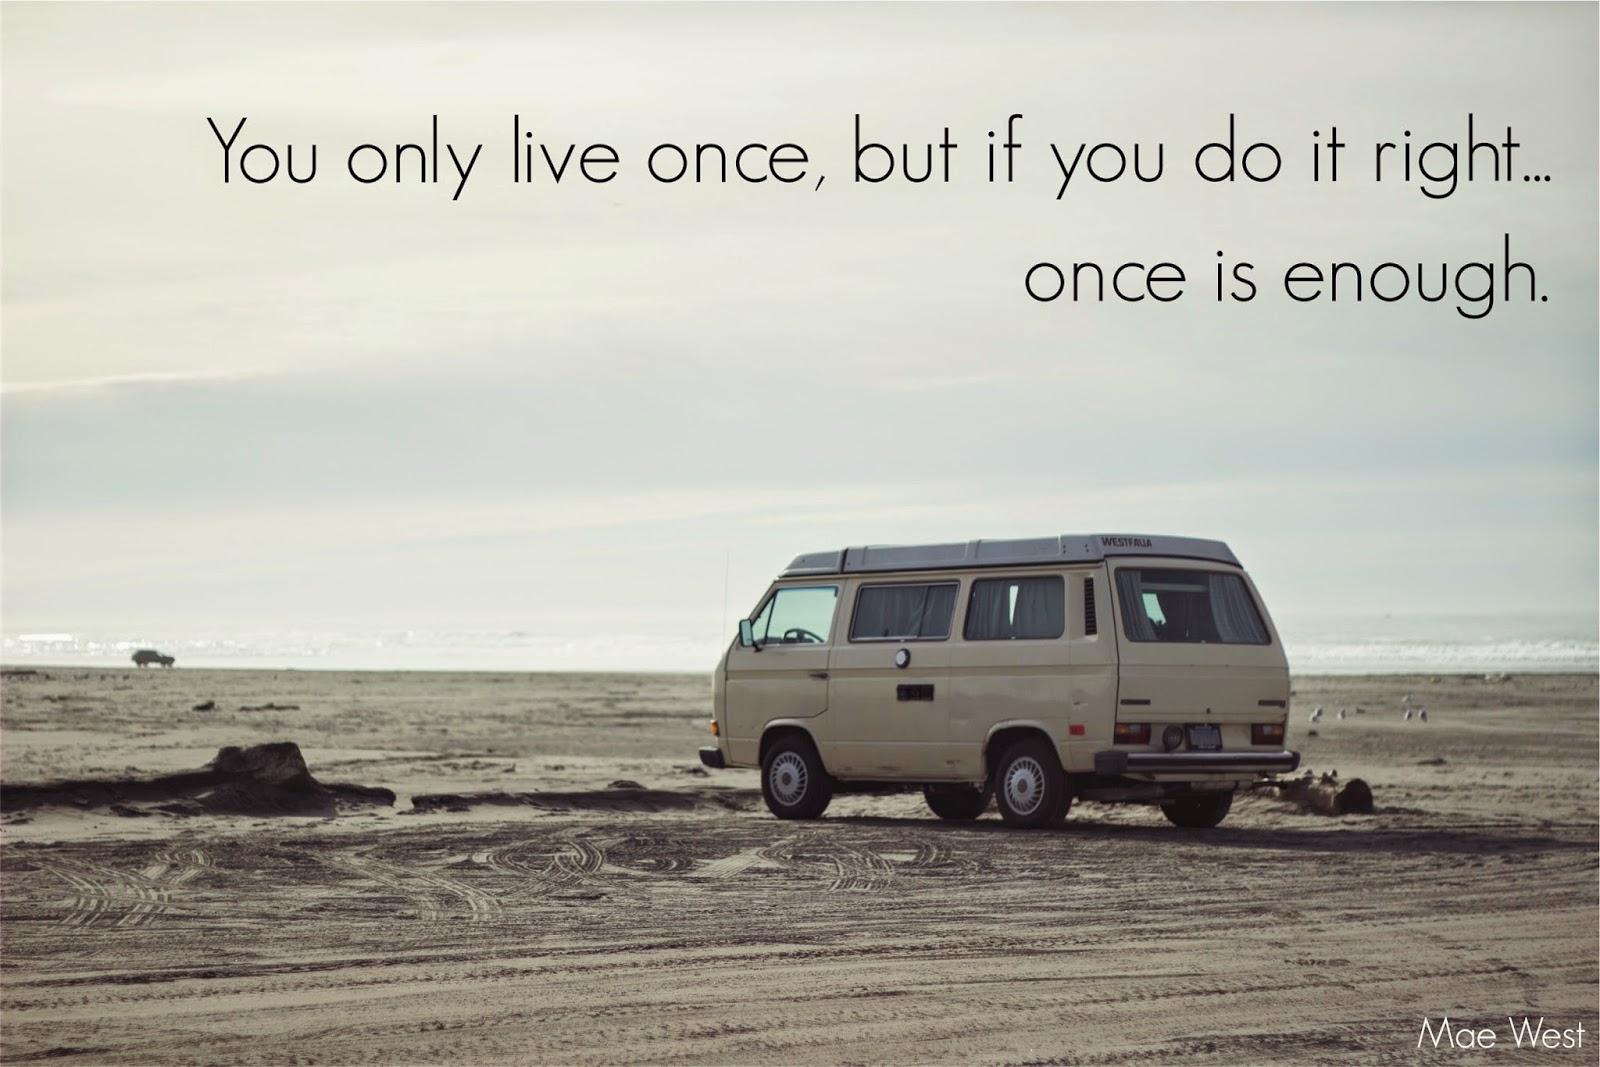 Van on a beach sunrise